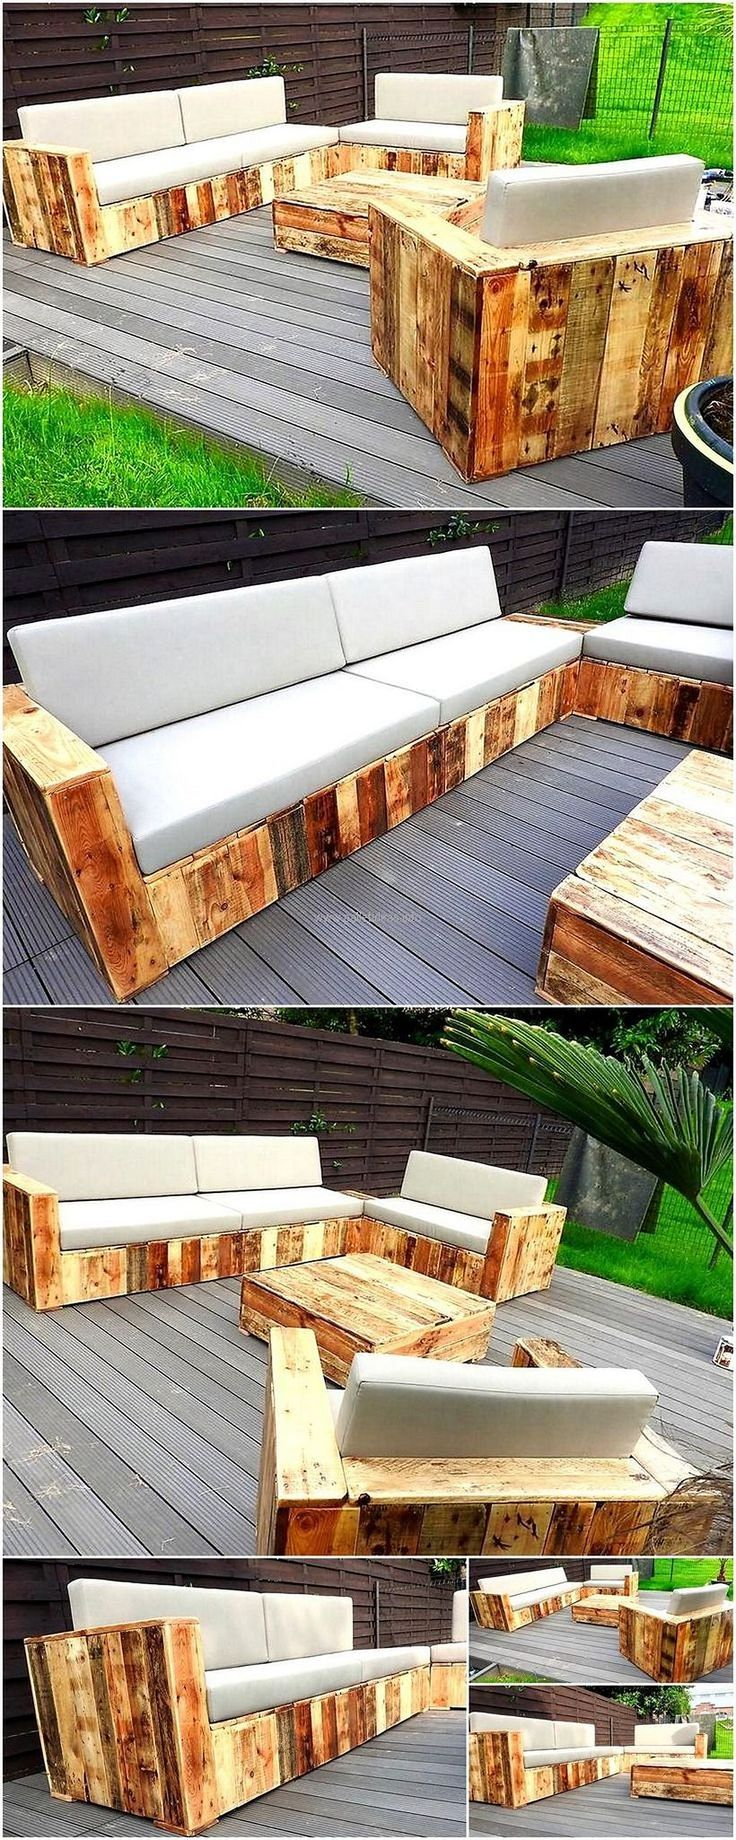 Gorgeous 70 Outdoor Pallet Furniture Inspiration https://architecturemagz.com/70-outdoor-pallet-furniture-inspiration/